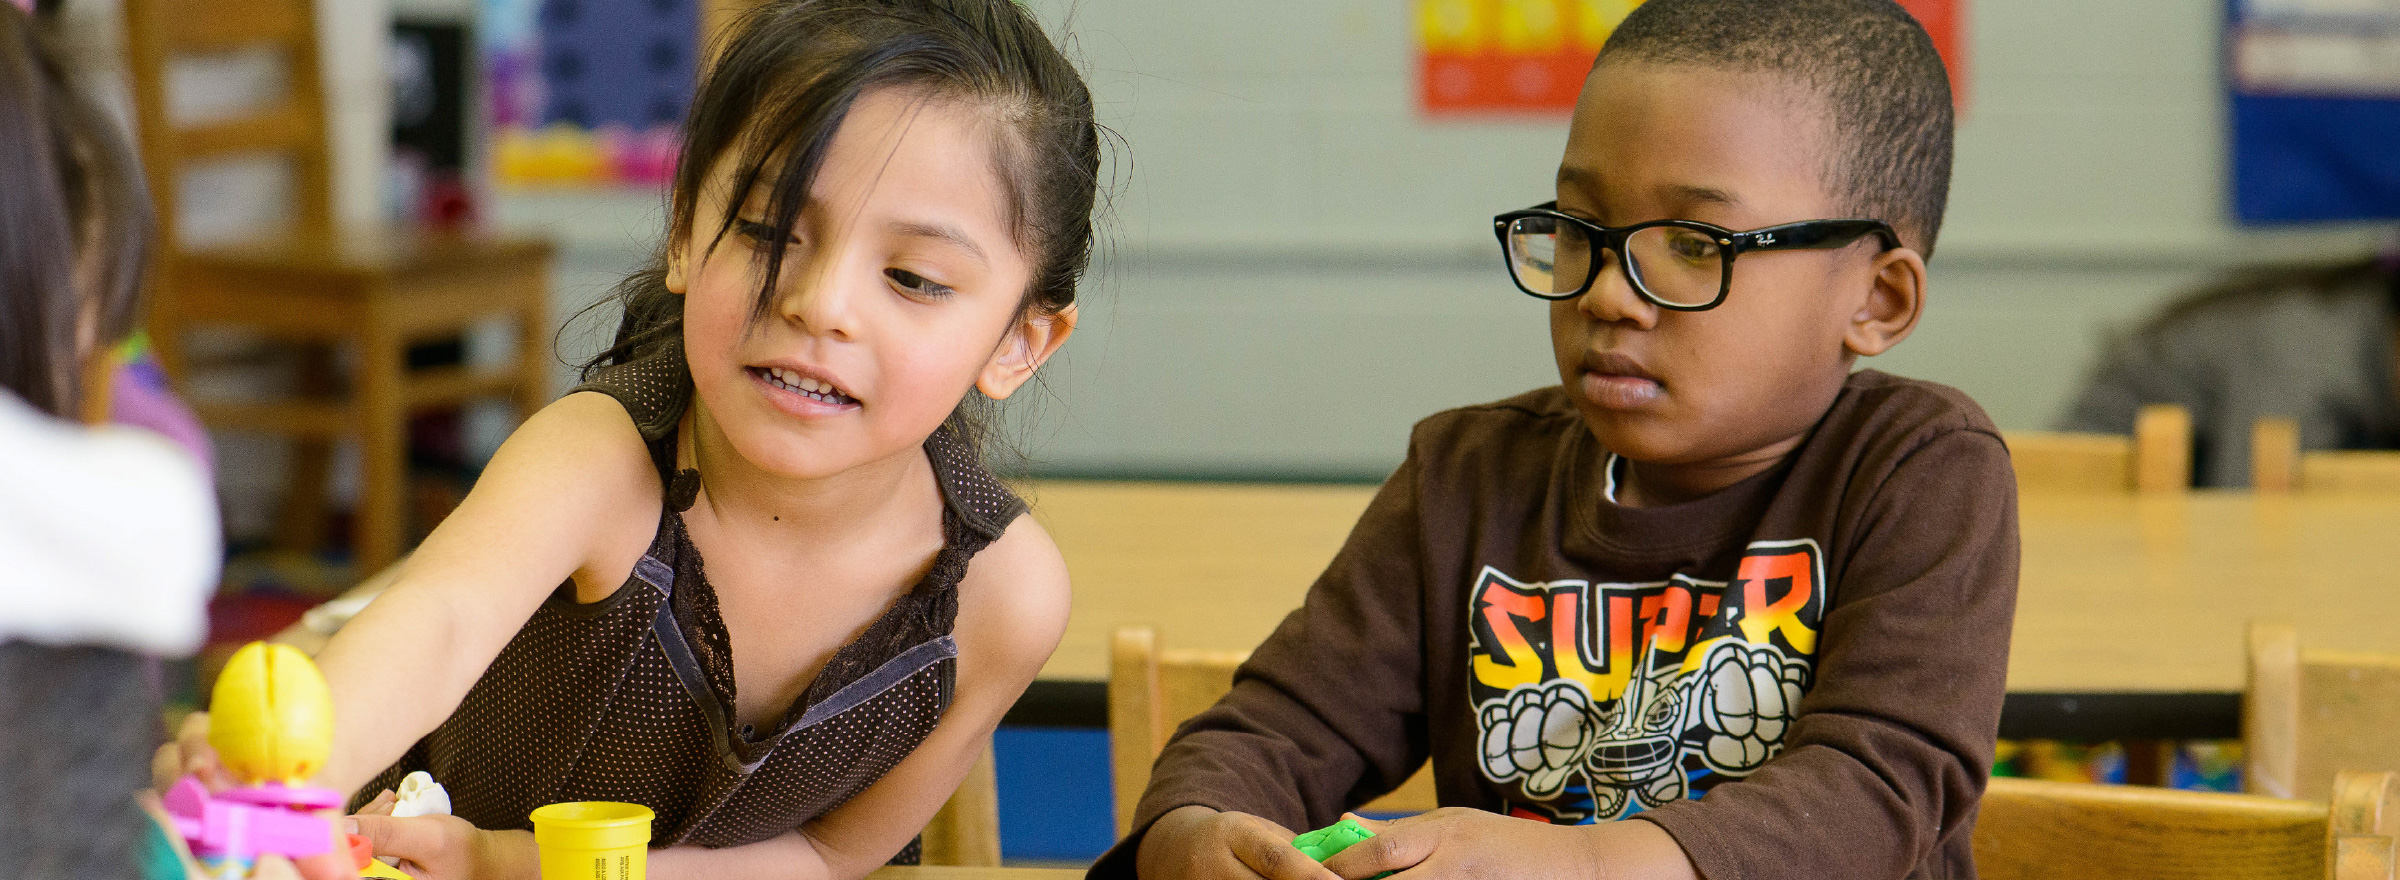 Chicago's Children Services Division - Delegates